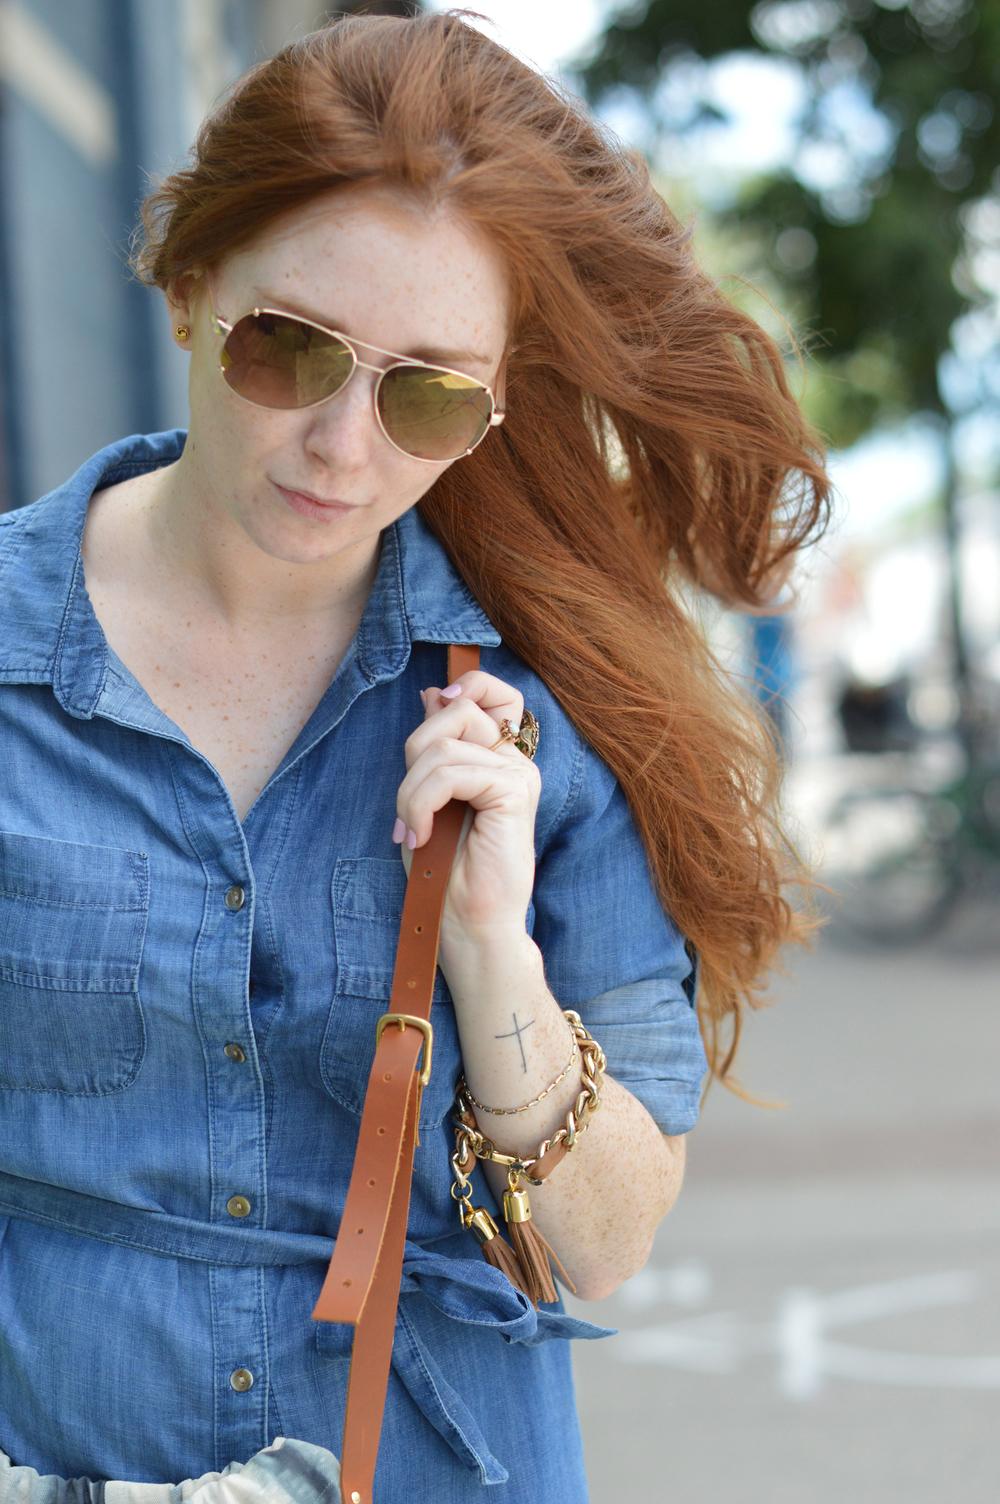 Hands & Teeth bag, Brave Leather bracelet, vintage rings